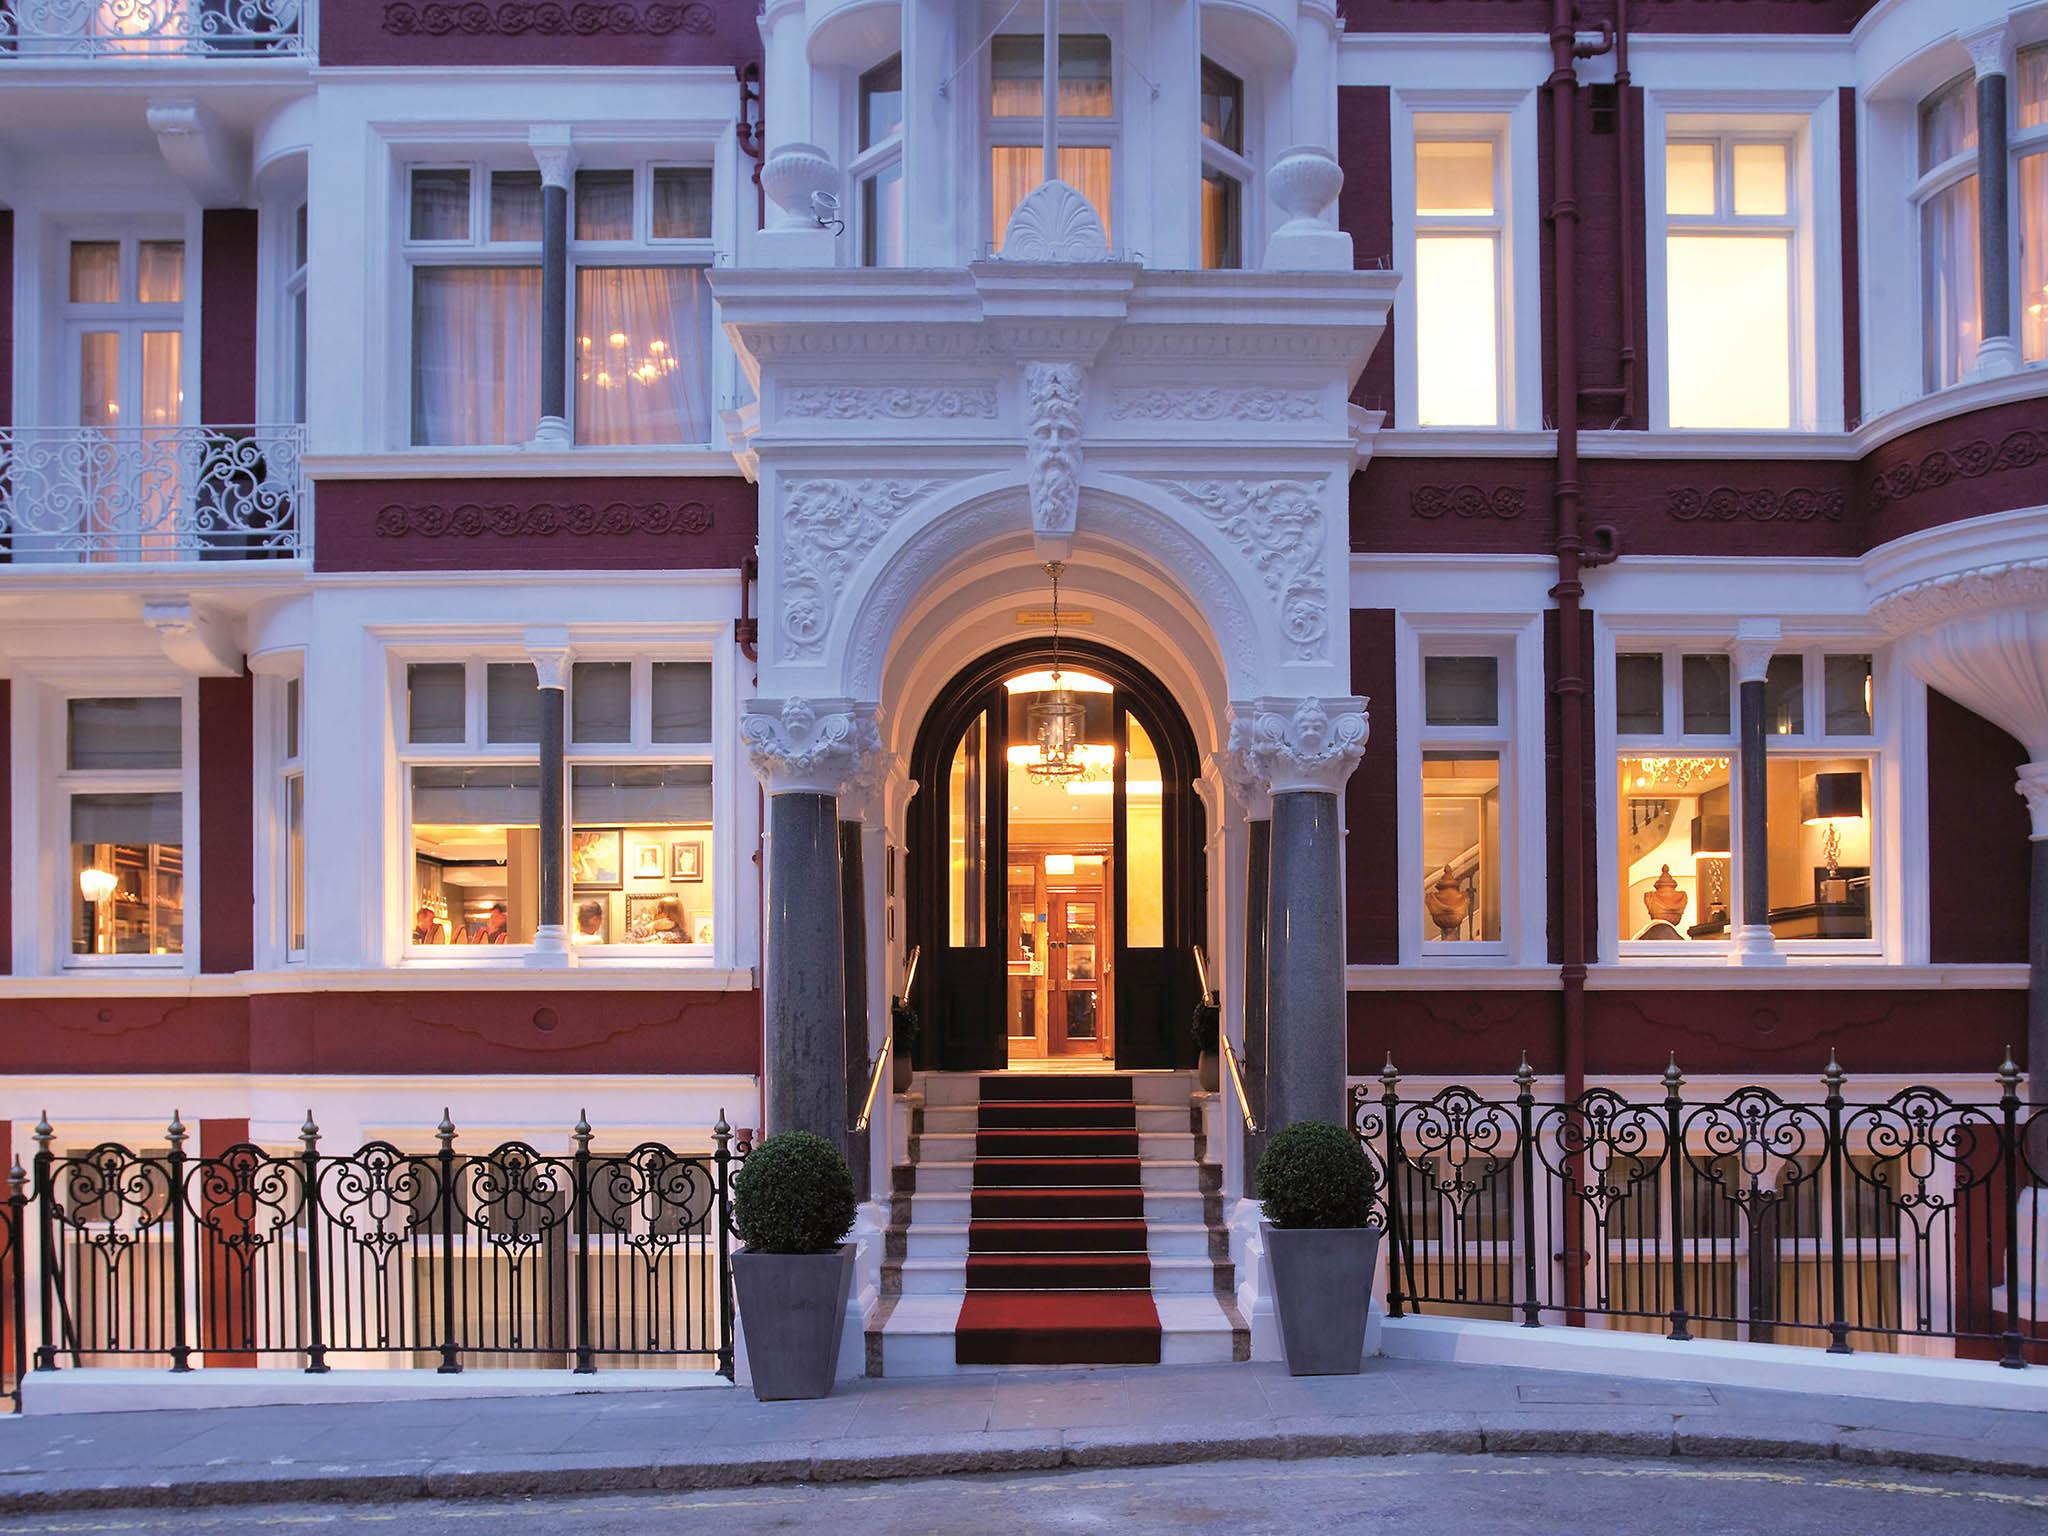 St James Hotel Club Mayfair